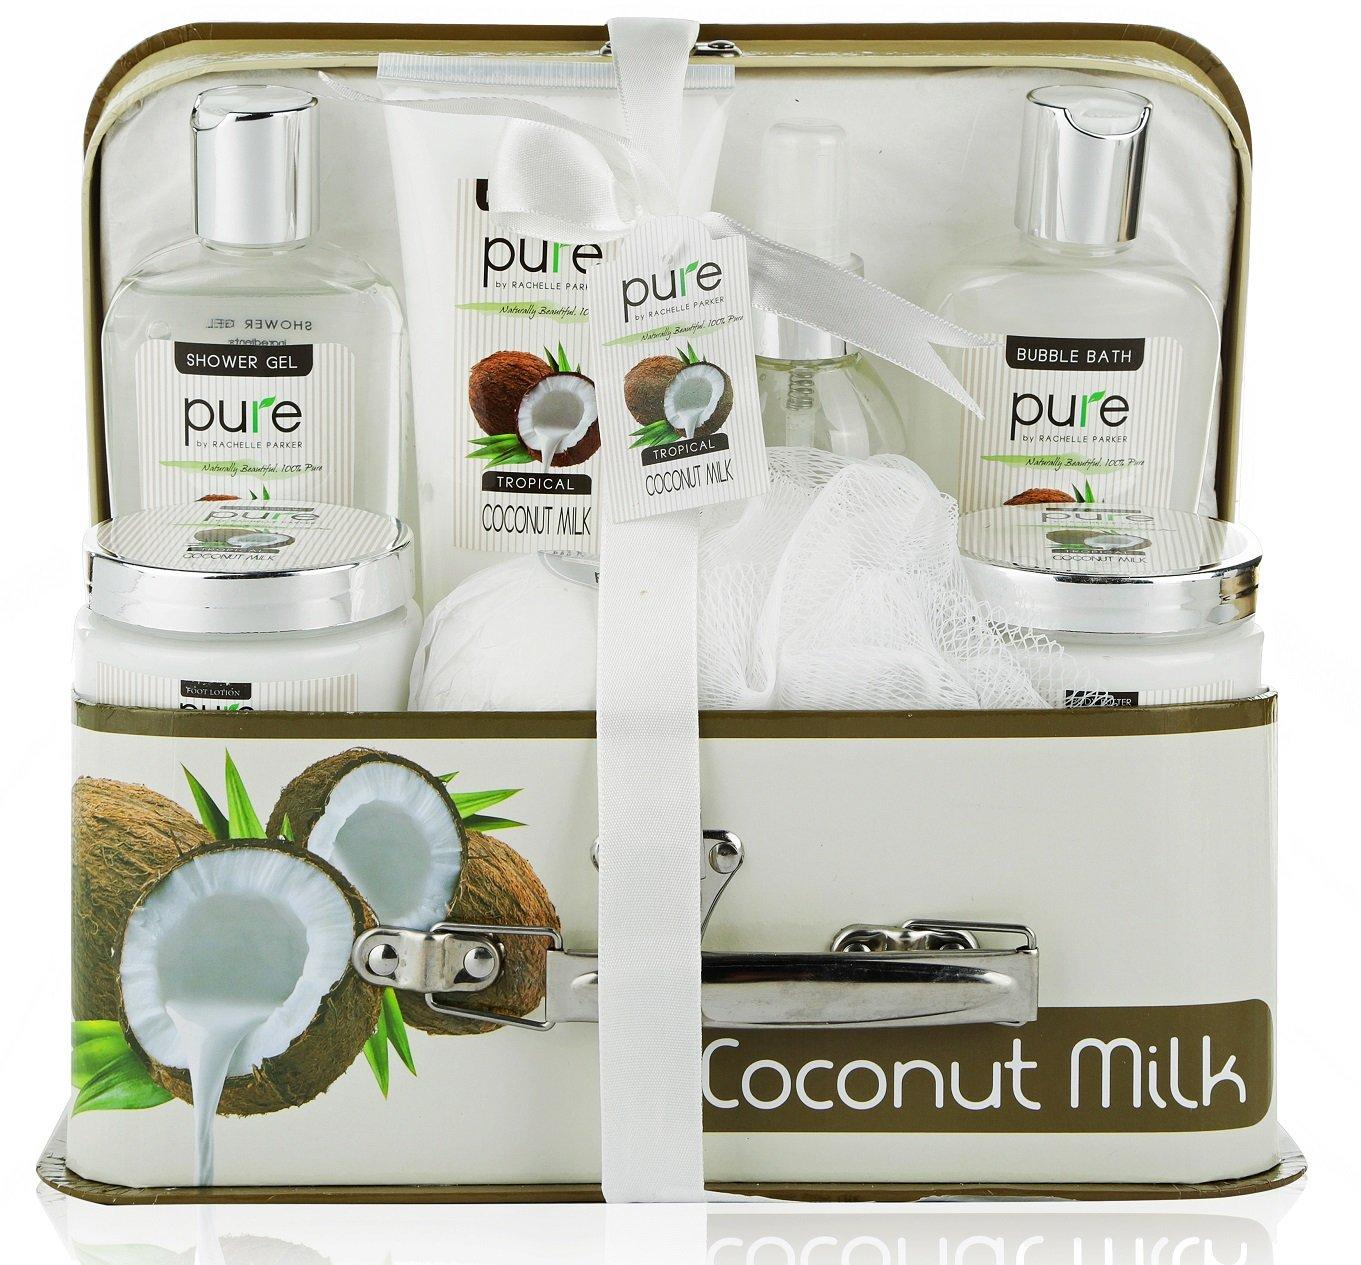 Essence of Luxury Spa Gift Basket Bath Set! PURE Spa Basket Natural Skin Care Gift Set Makes Best Christmas Gift for Women & Holiday Gift Baskets! (Coconut Milk Skincare Gift Set)